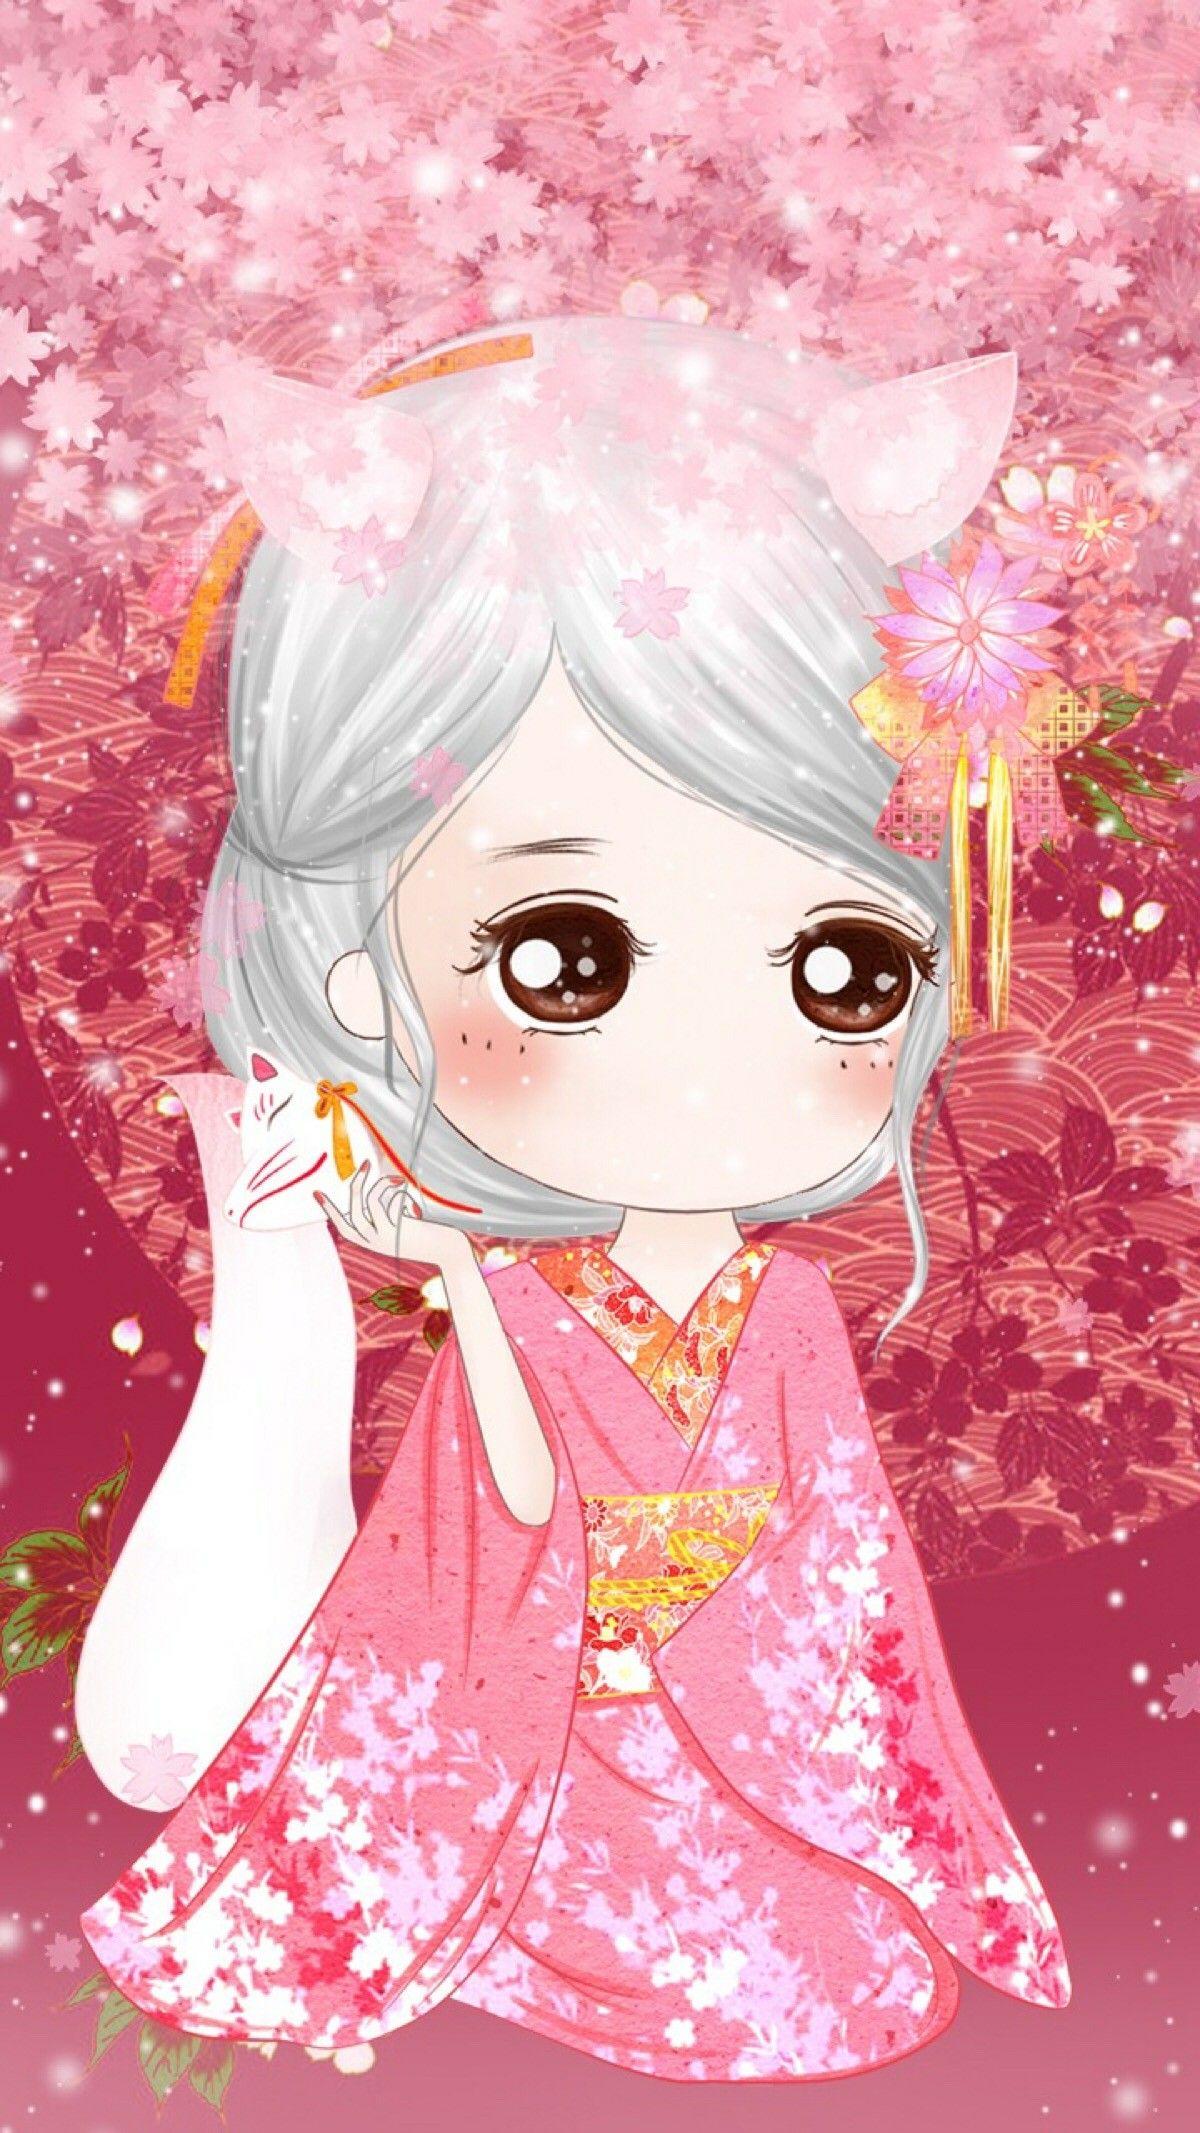 Pin By Lucia Gamboa On Beb Pinterest Chibi Kawaii And Anime